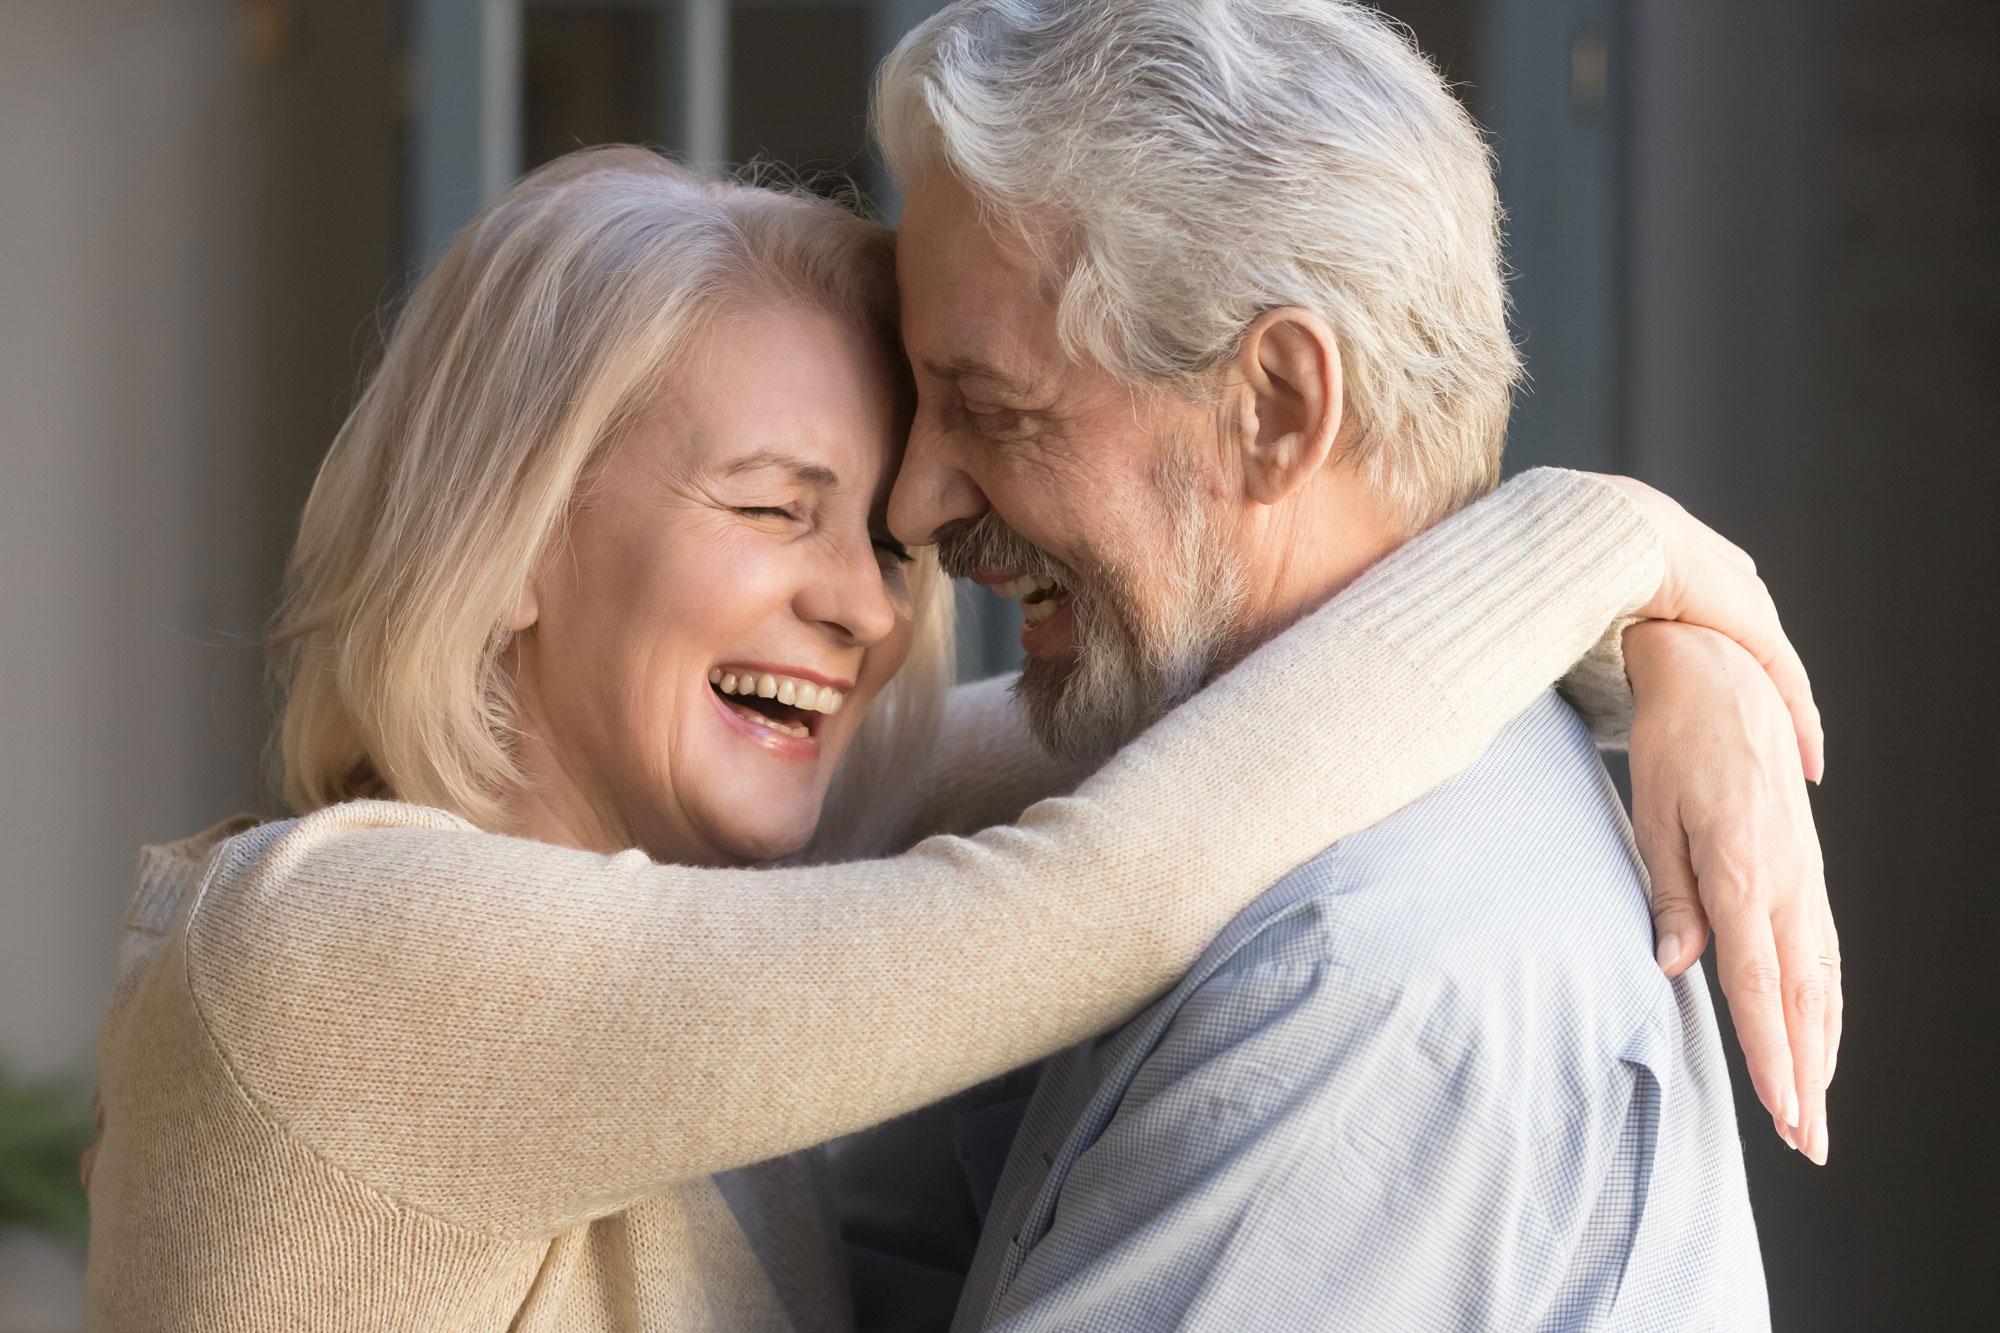 L'osteoporosi si combatte a tavola